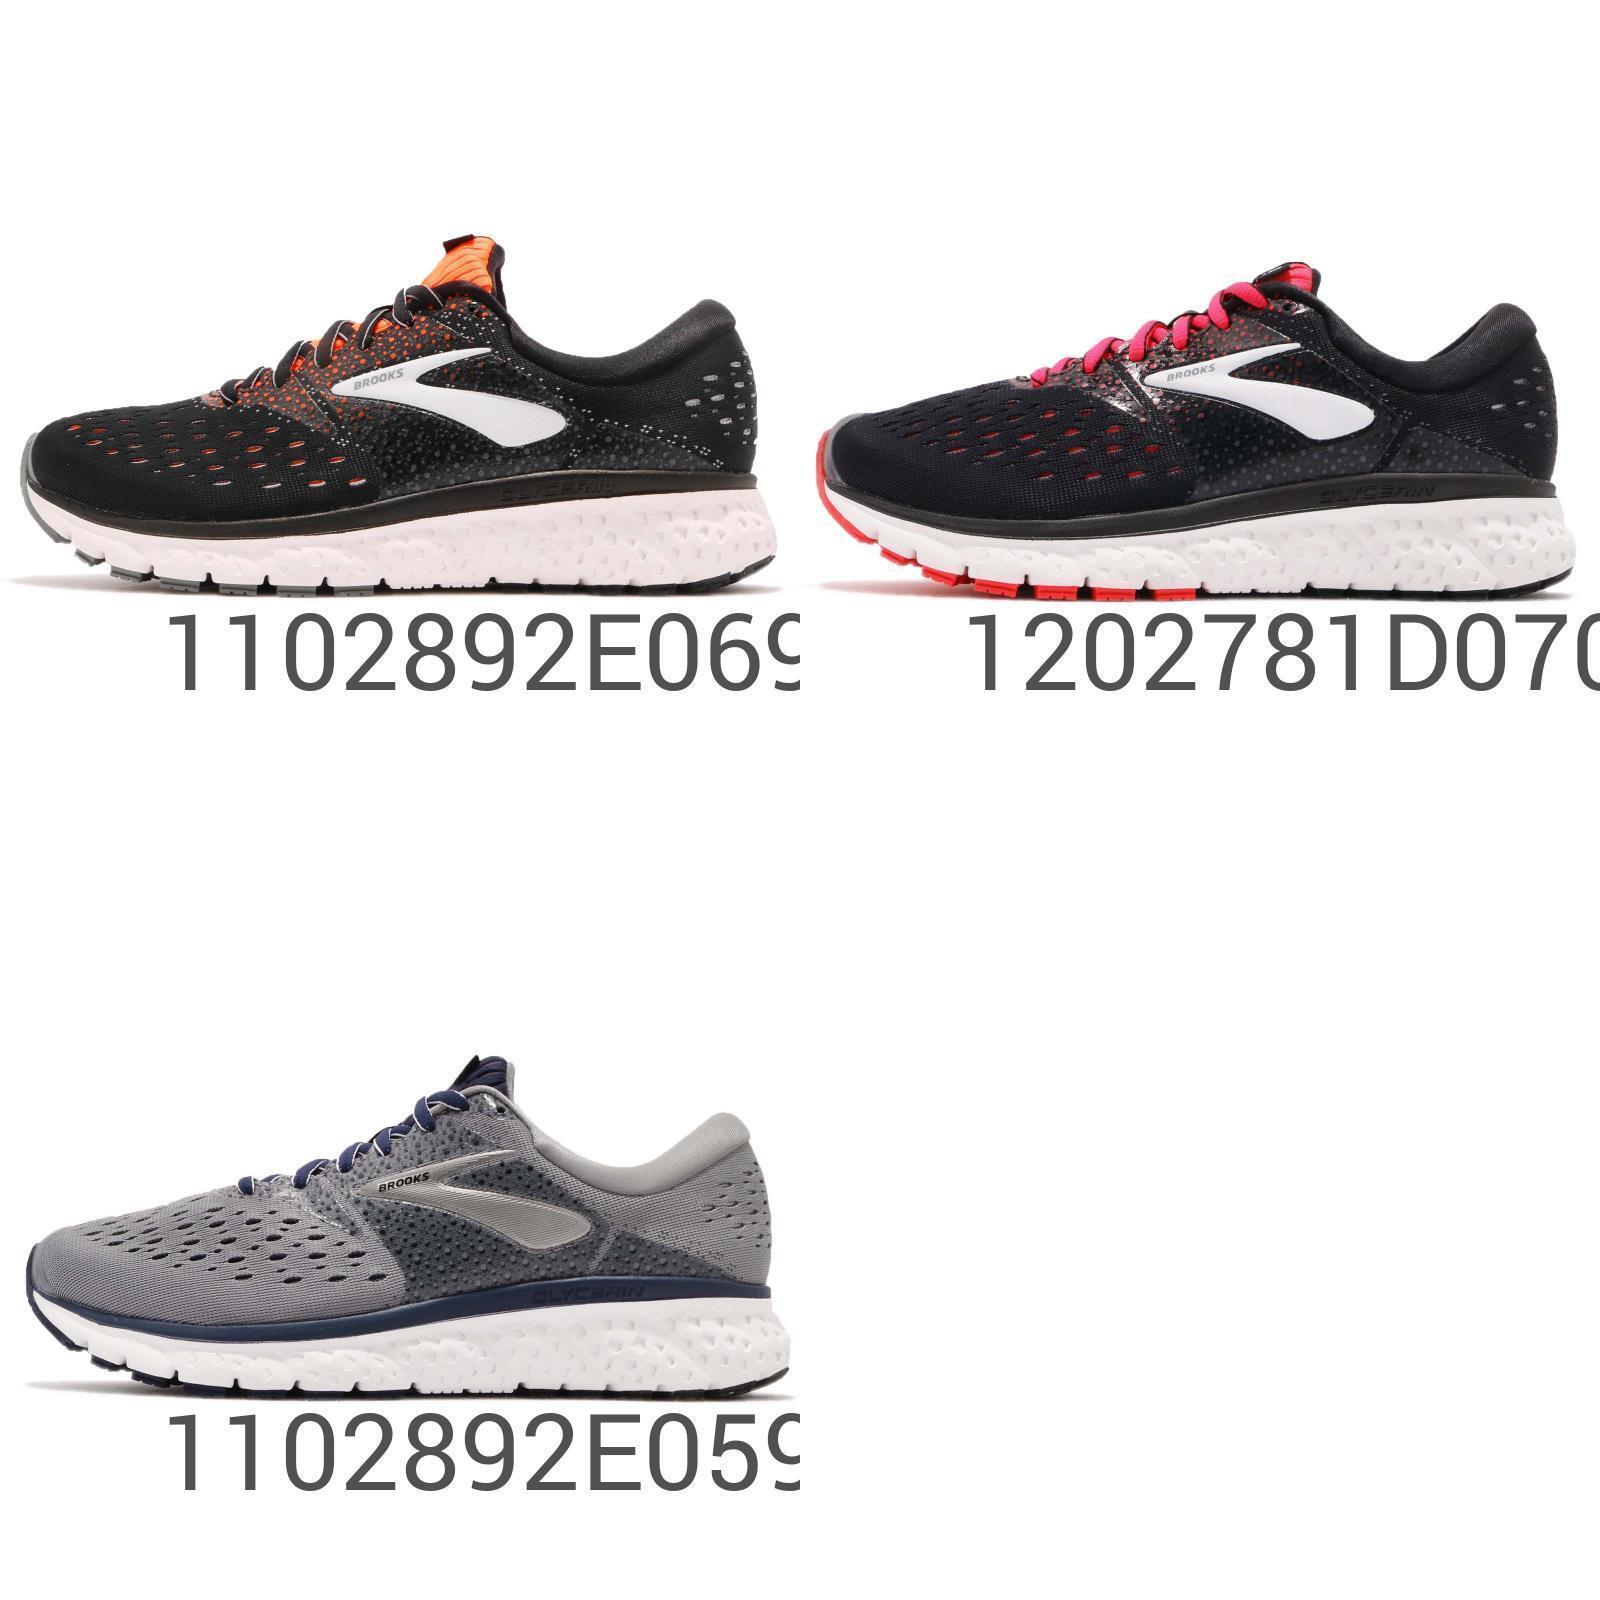 Brooks Glycerin 16 grand Hommes Femmes neutre Cushion FonctionneHommest chaussures paniers Pick 1